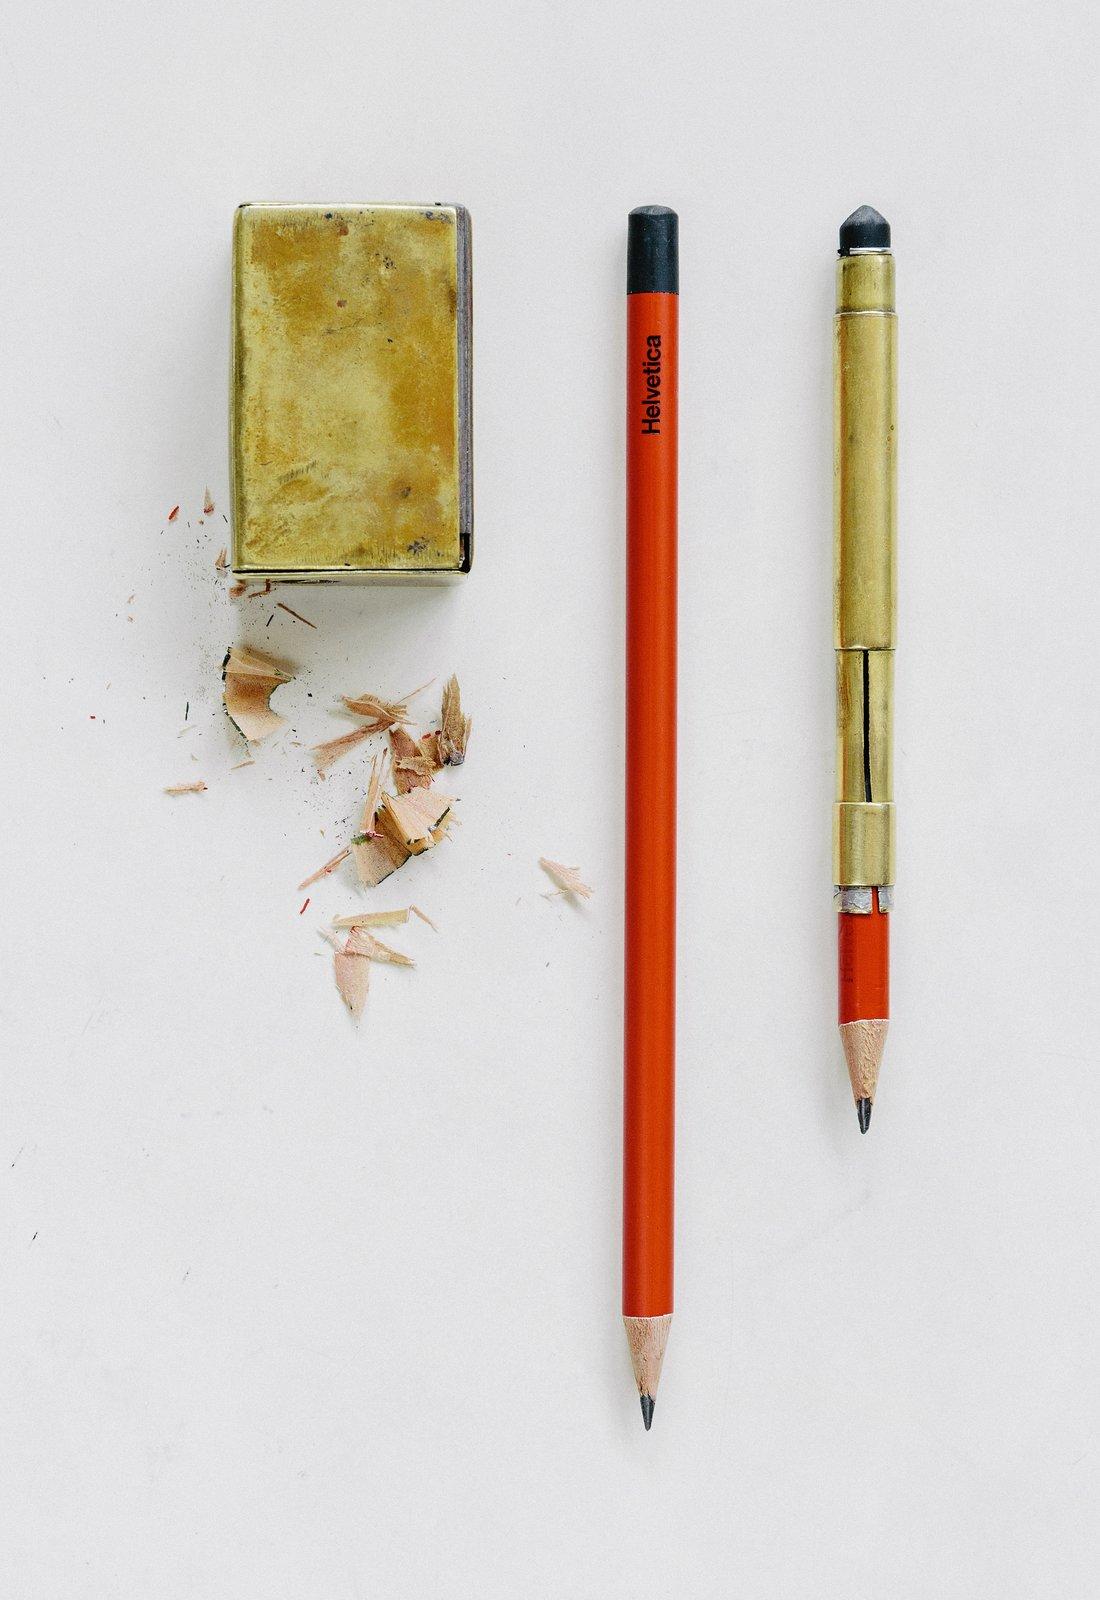 architect office supplies. Bainbridge Island Architect Jim Cutler Has Found The Perfect Pencil Office Supplies |